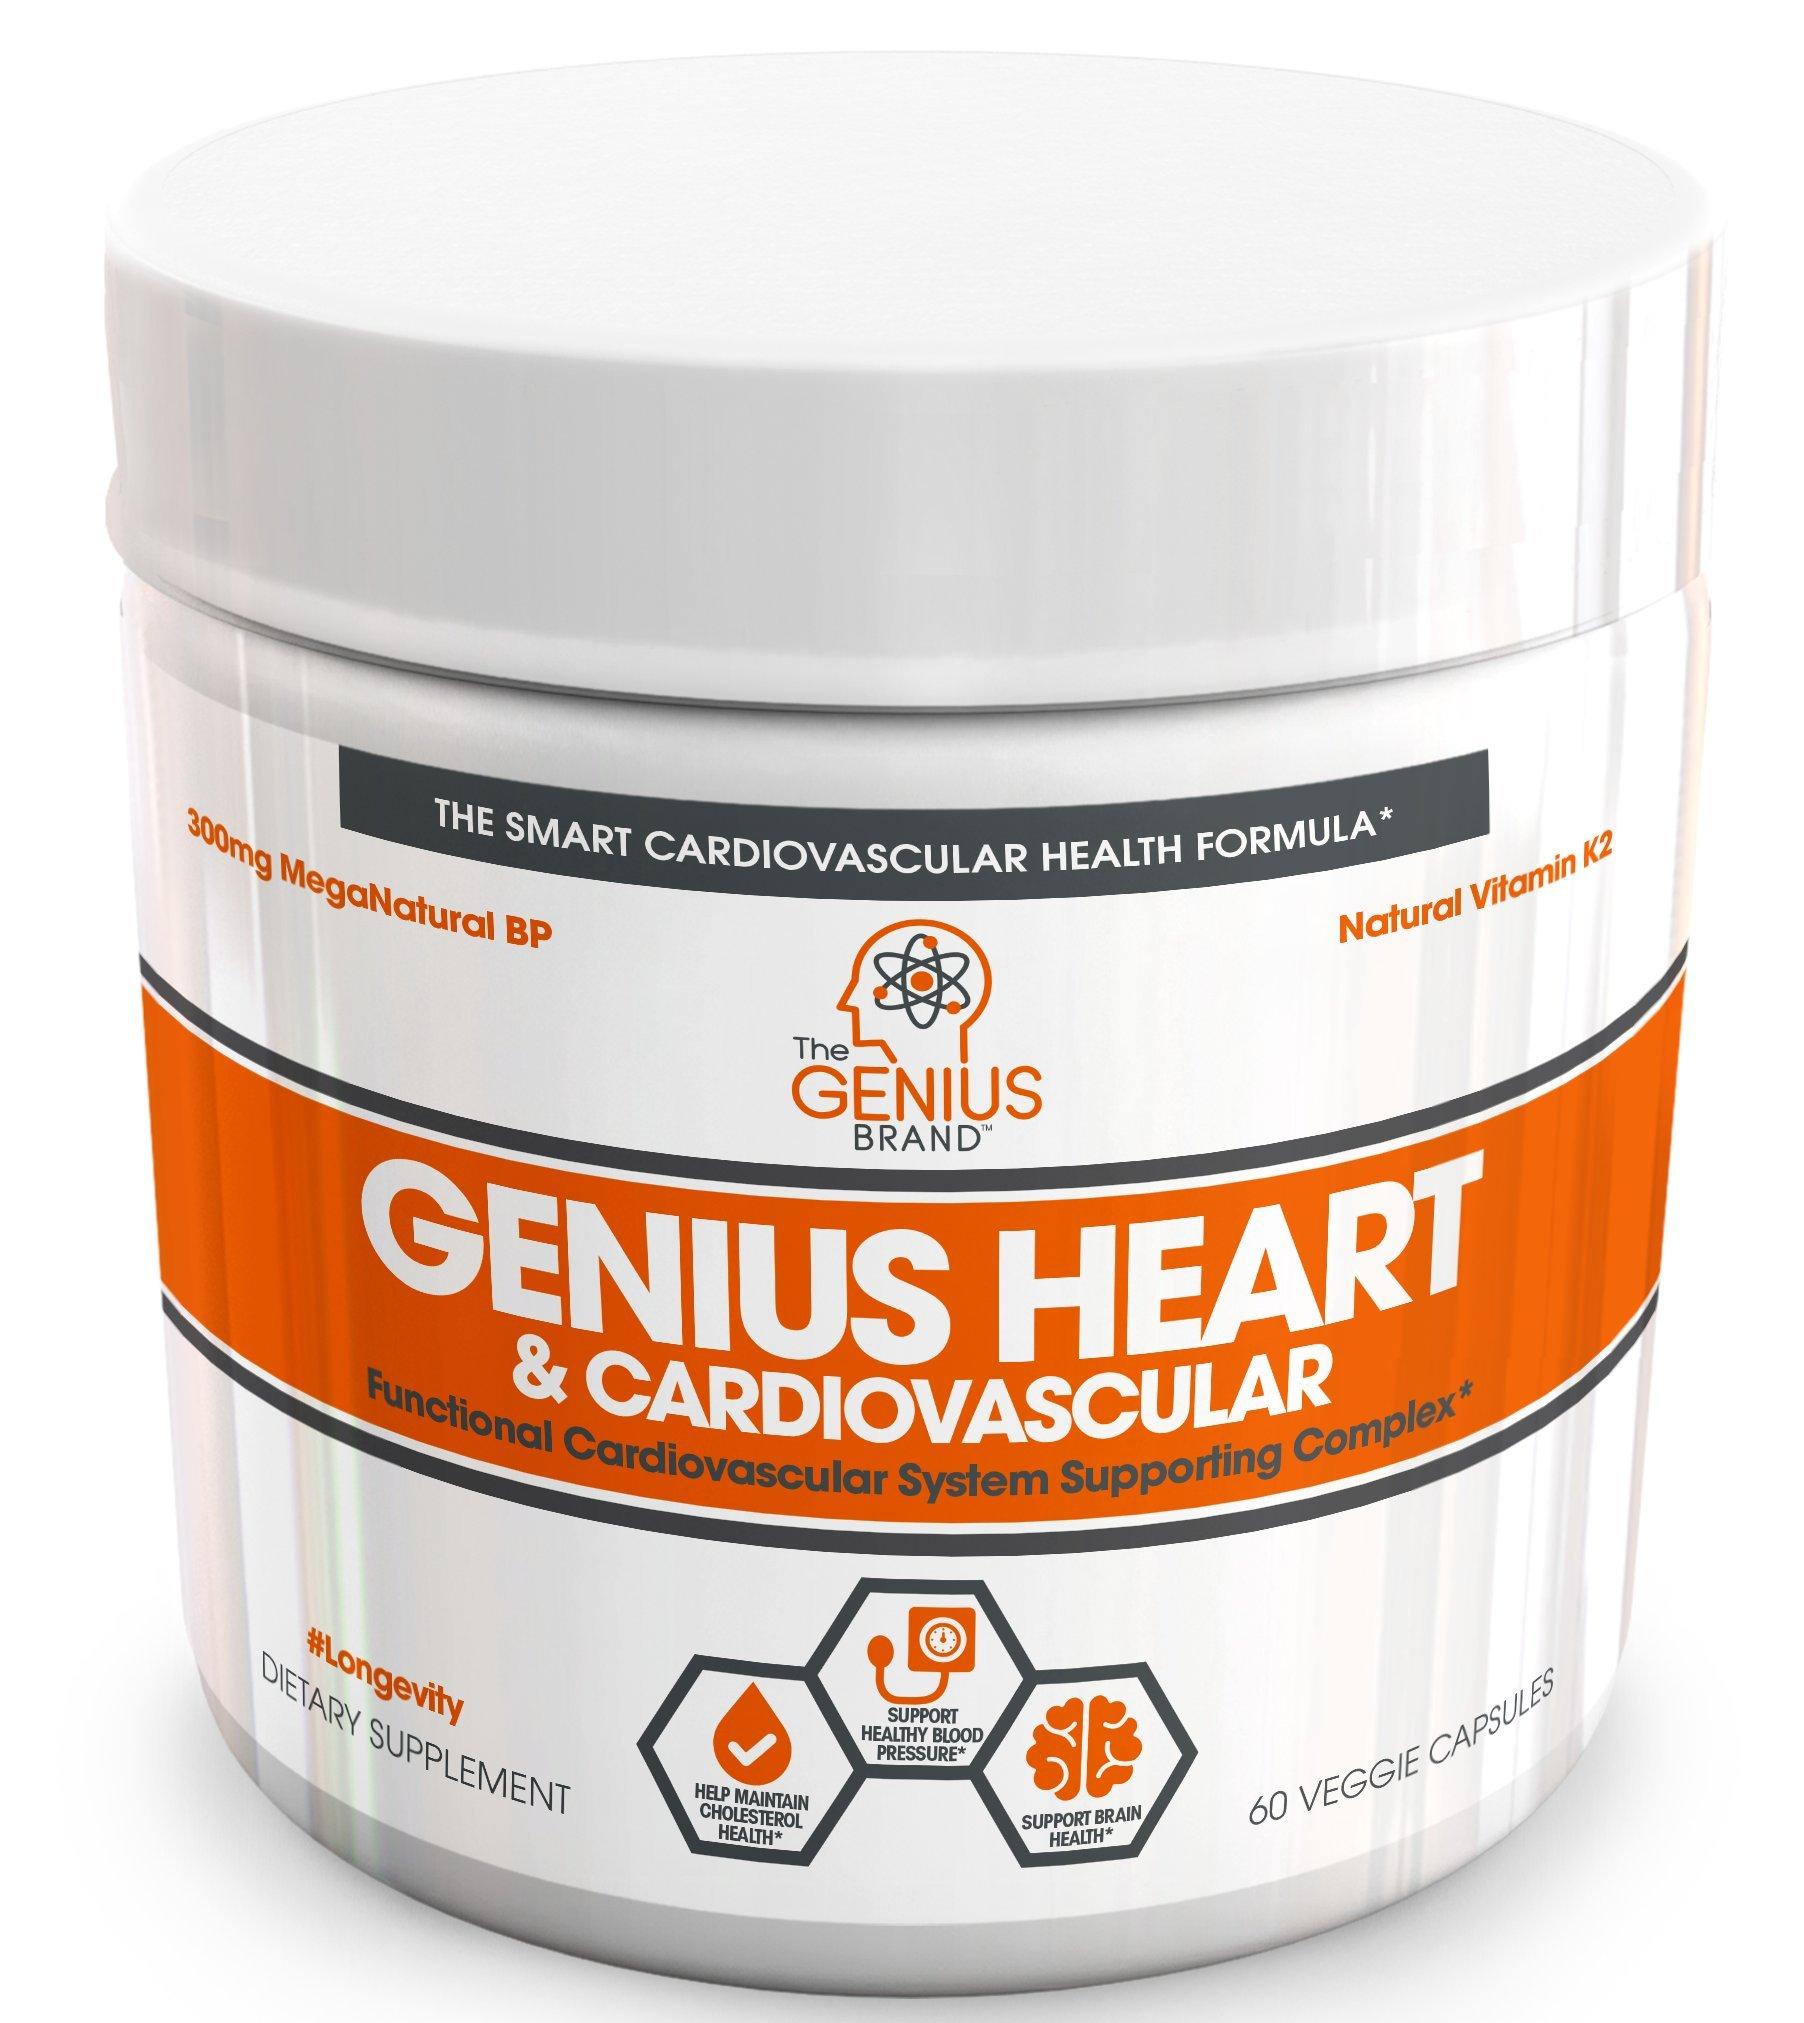 Genius Heart & Cardiovascular Health Supplement – Cholesterol Lowering Vein & Blood Pressure Support w/ Grape Seed Extract, Vitamin K2 MK7 & CoQ10 – Antioxidant Energy For Men & Women,60 Veggie Pills